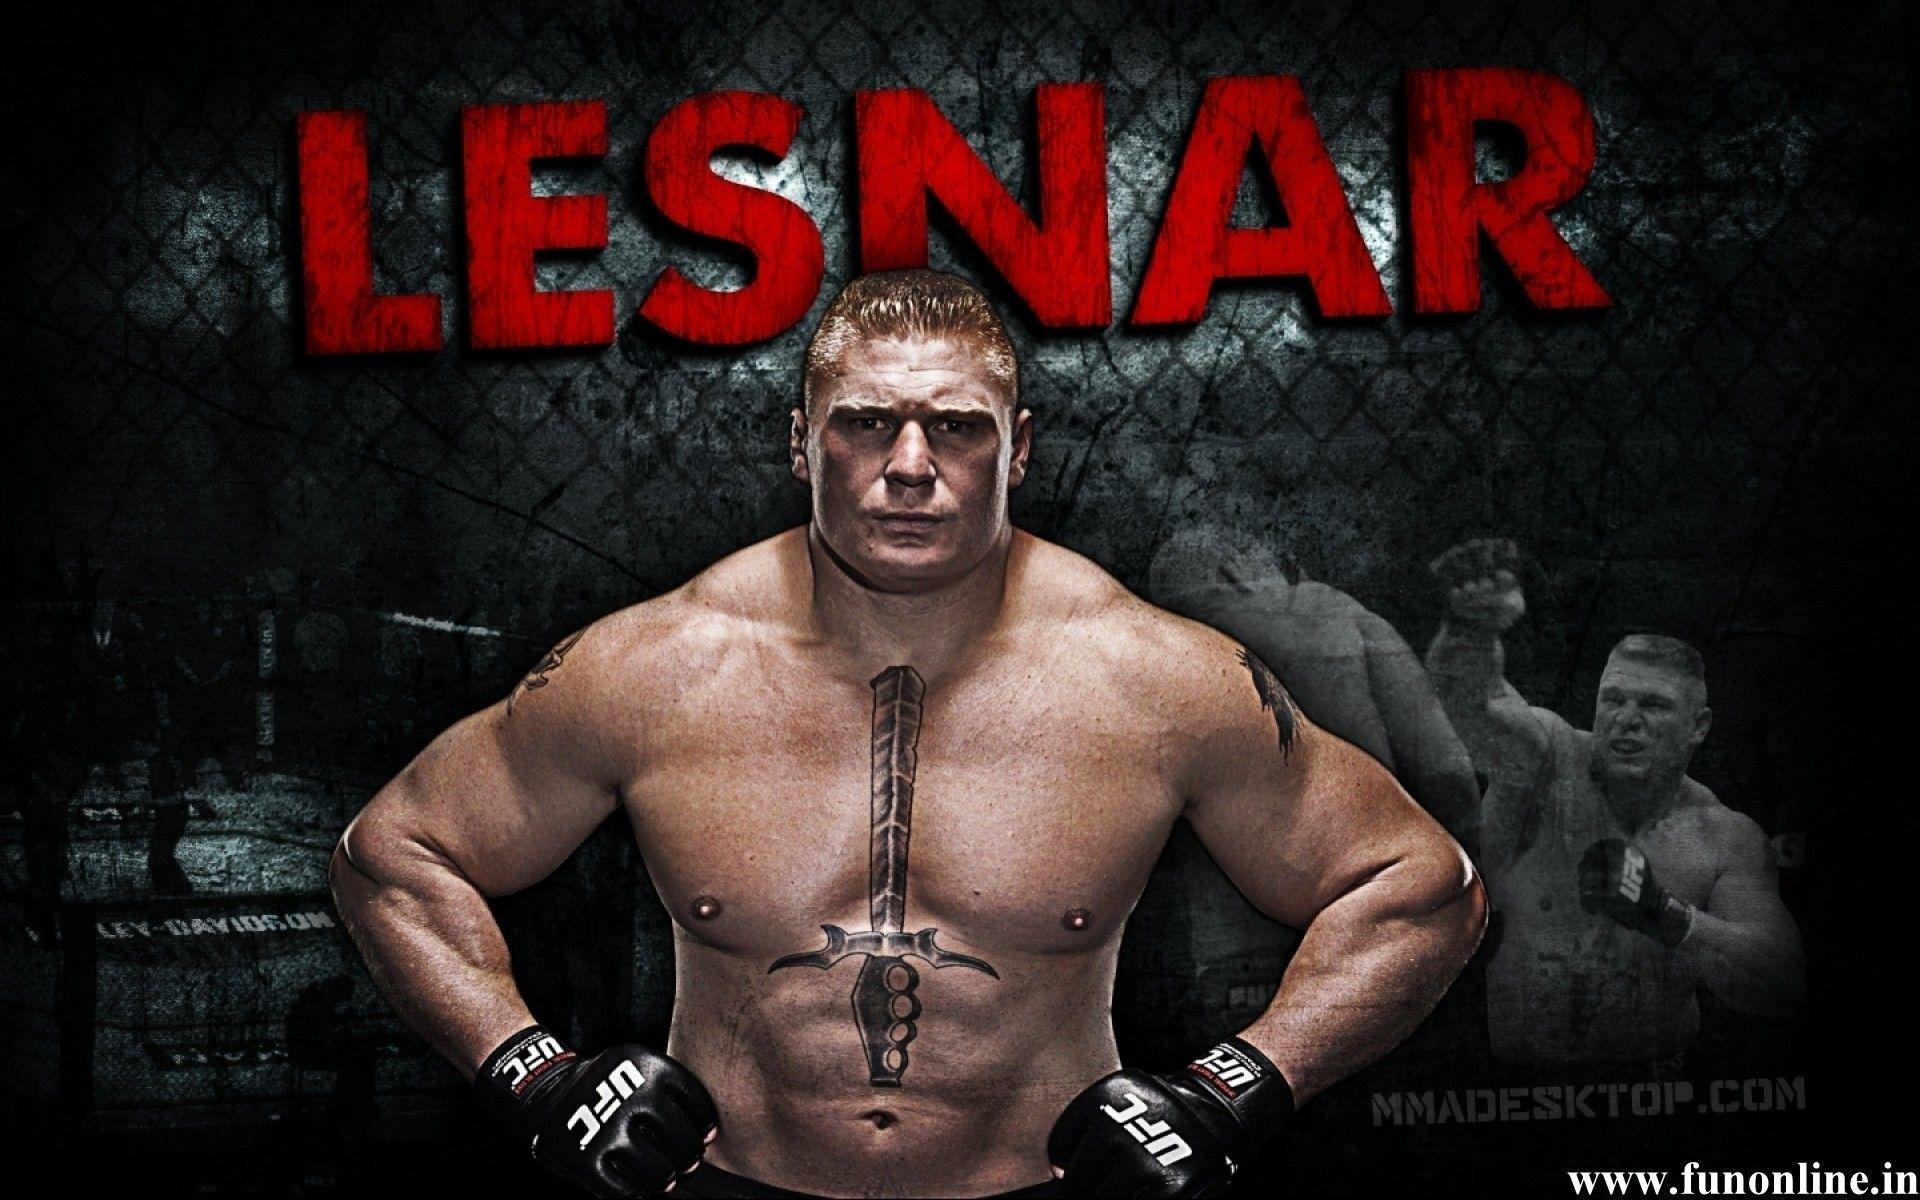 Brock Lesnar Wallpaper Hd Brock Lesnar Hd Backgrounds Mma